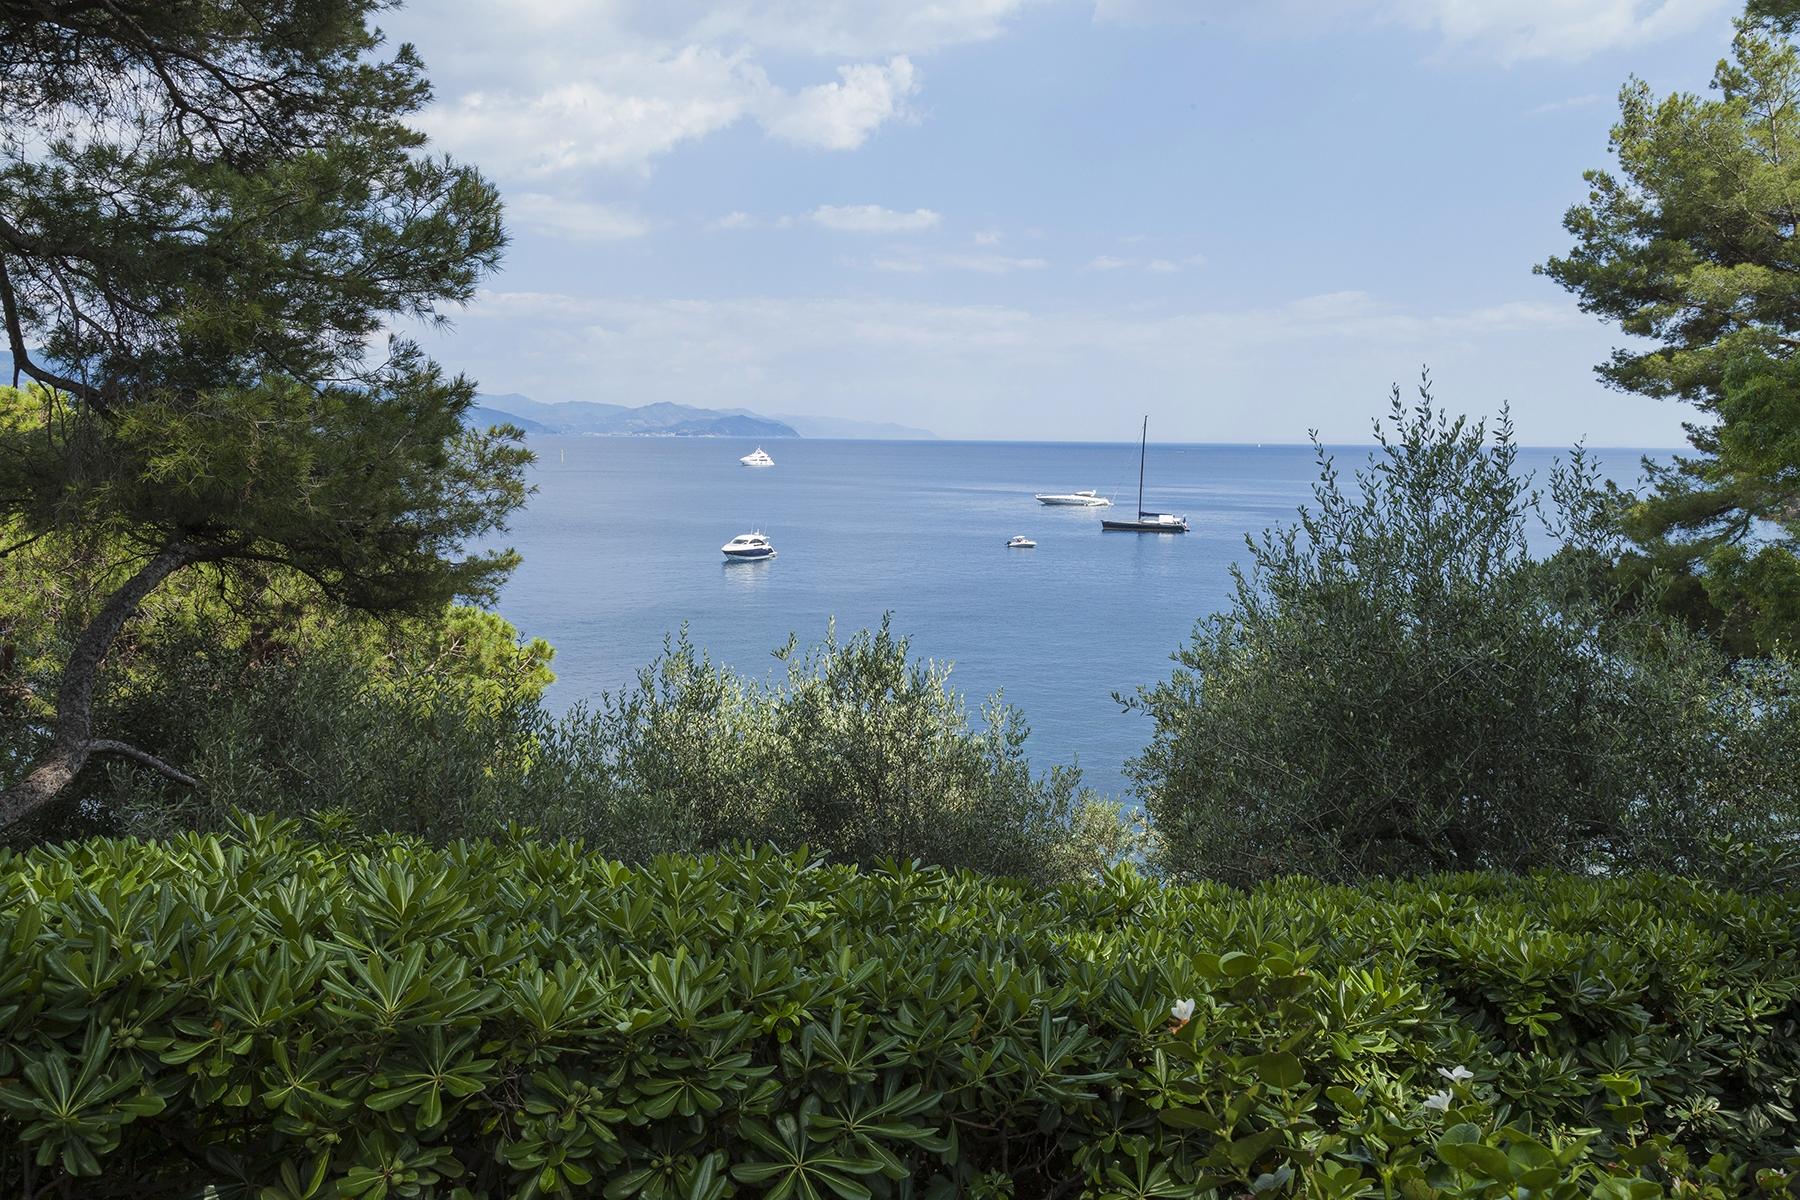 Villa in Vendita a Santa Margherita Ligure: 5 locali, 580 mq - Foto 4